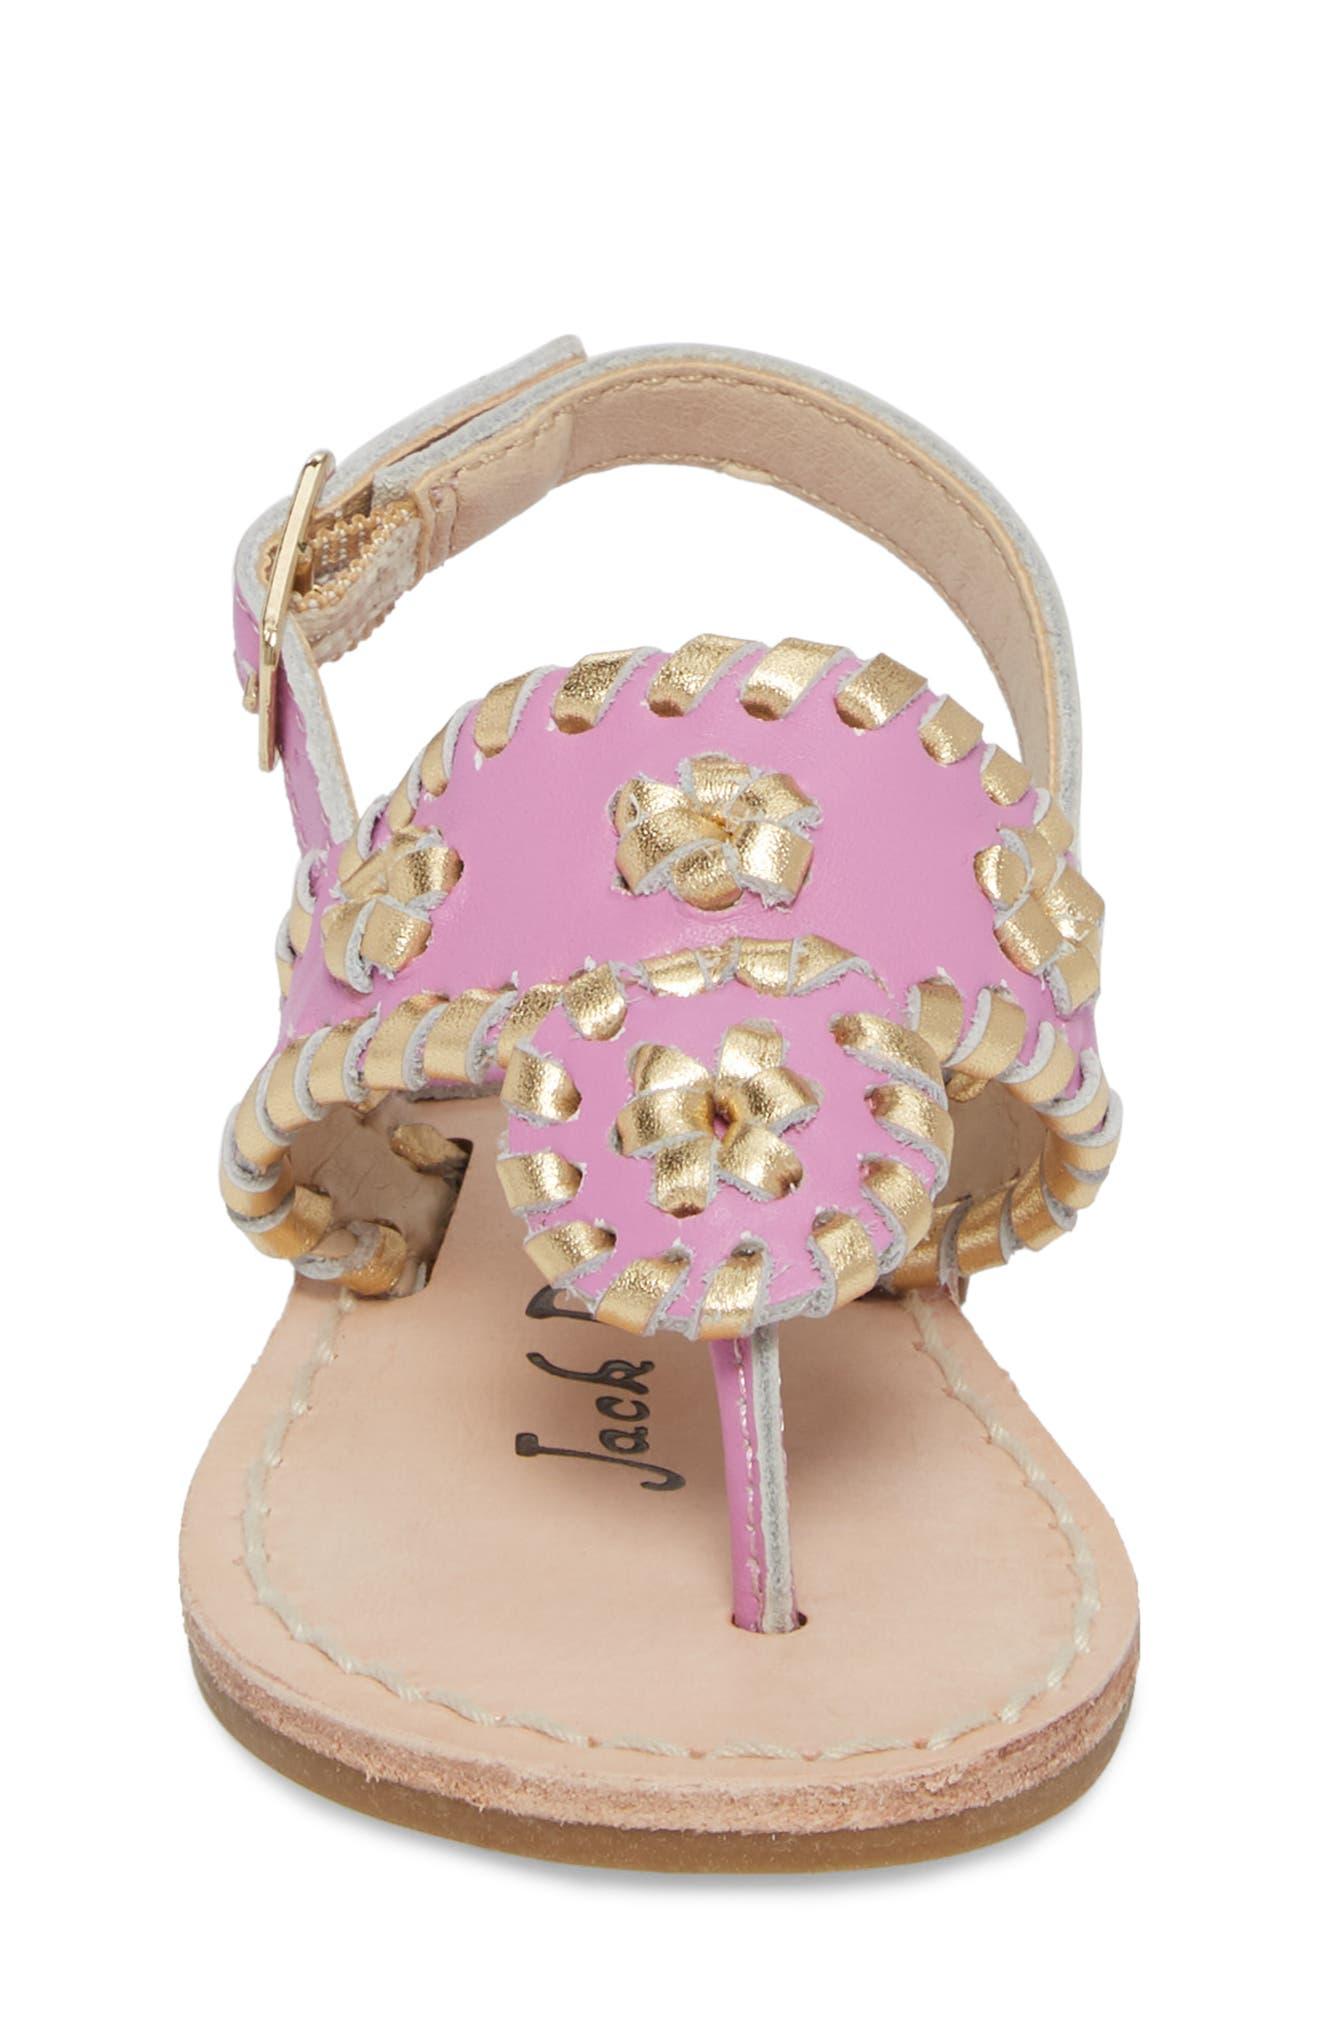 Little Miss Hollis Metallic Trim Sandal,                             Alternate thumbnail 4, color,                             Lavender Pink/ Gold Leather